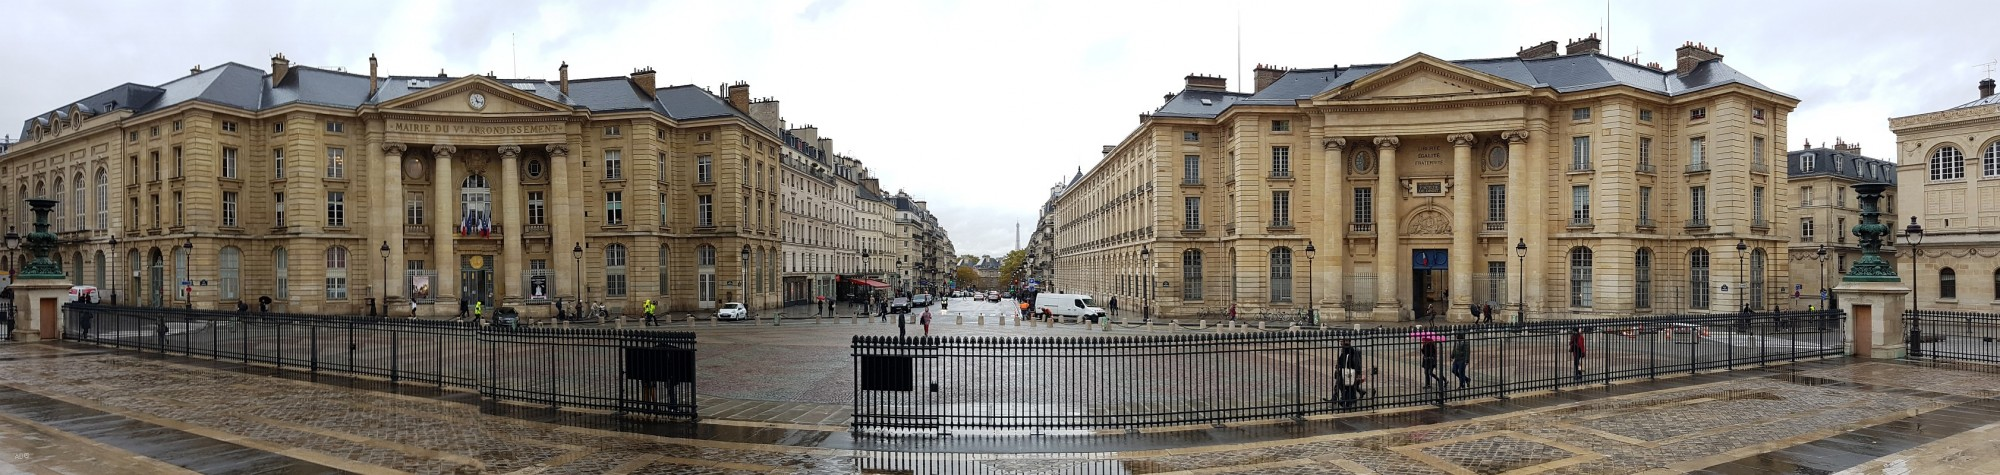 Площадь Пантеона